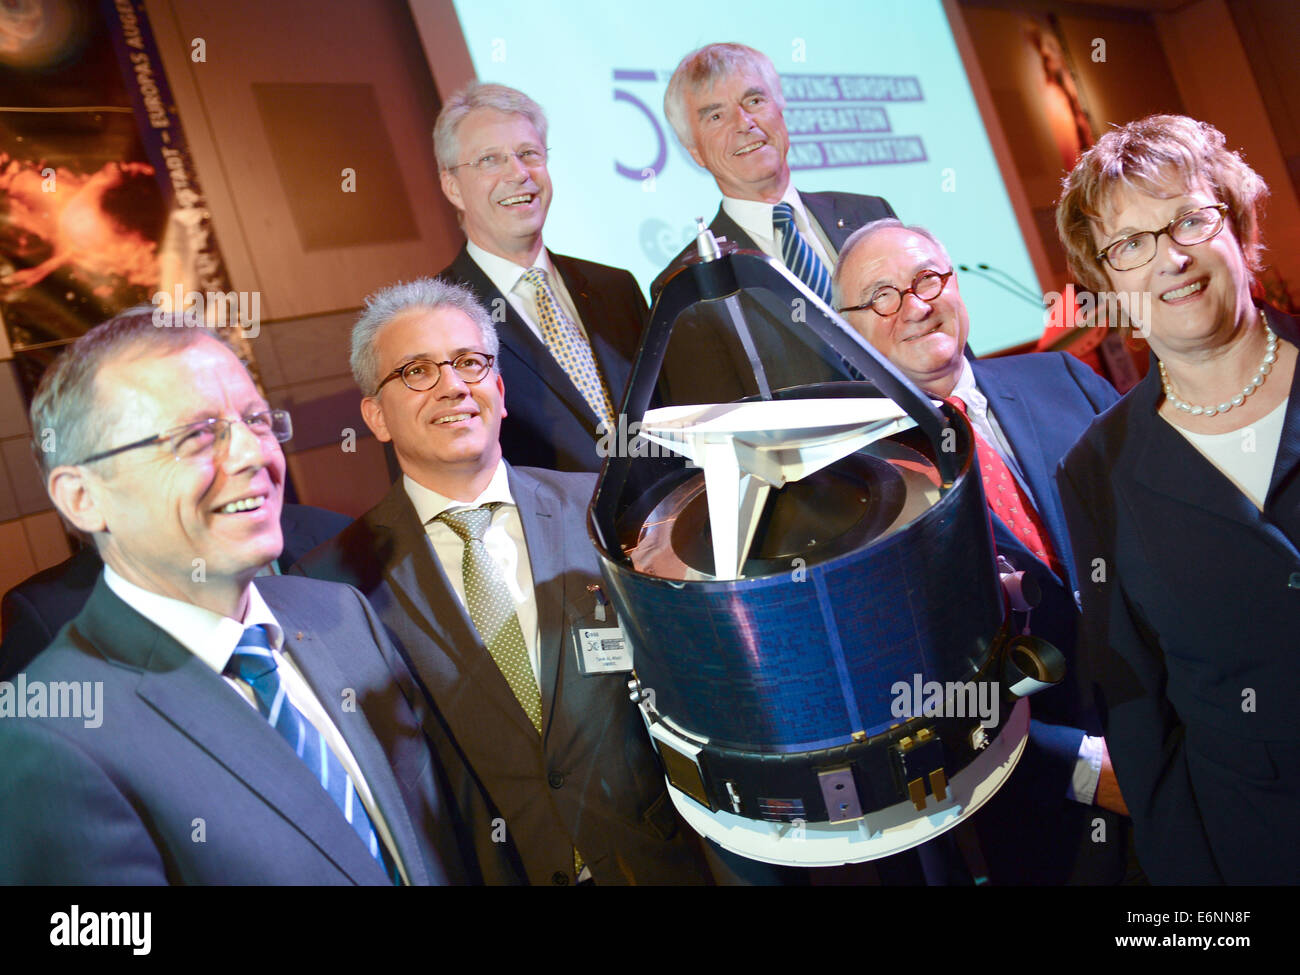 Chairman of the German Aerospace Center (DLR) Johann-Dietrich Woerner (L-R), Economics Minister of Hesse Tarek Al - Stock Image